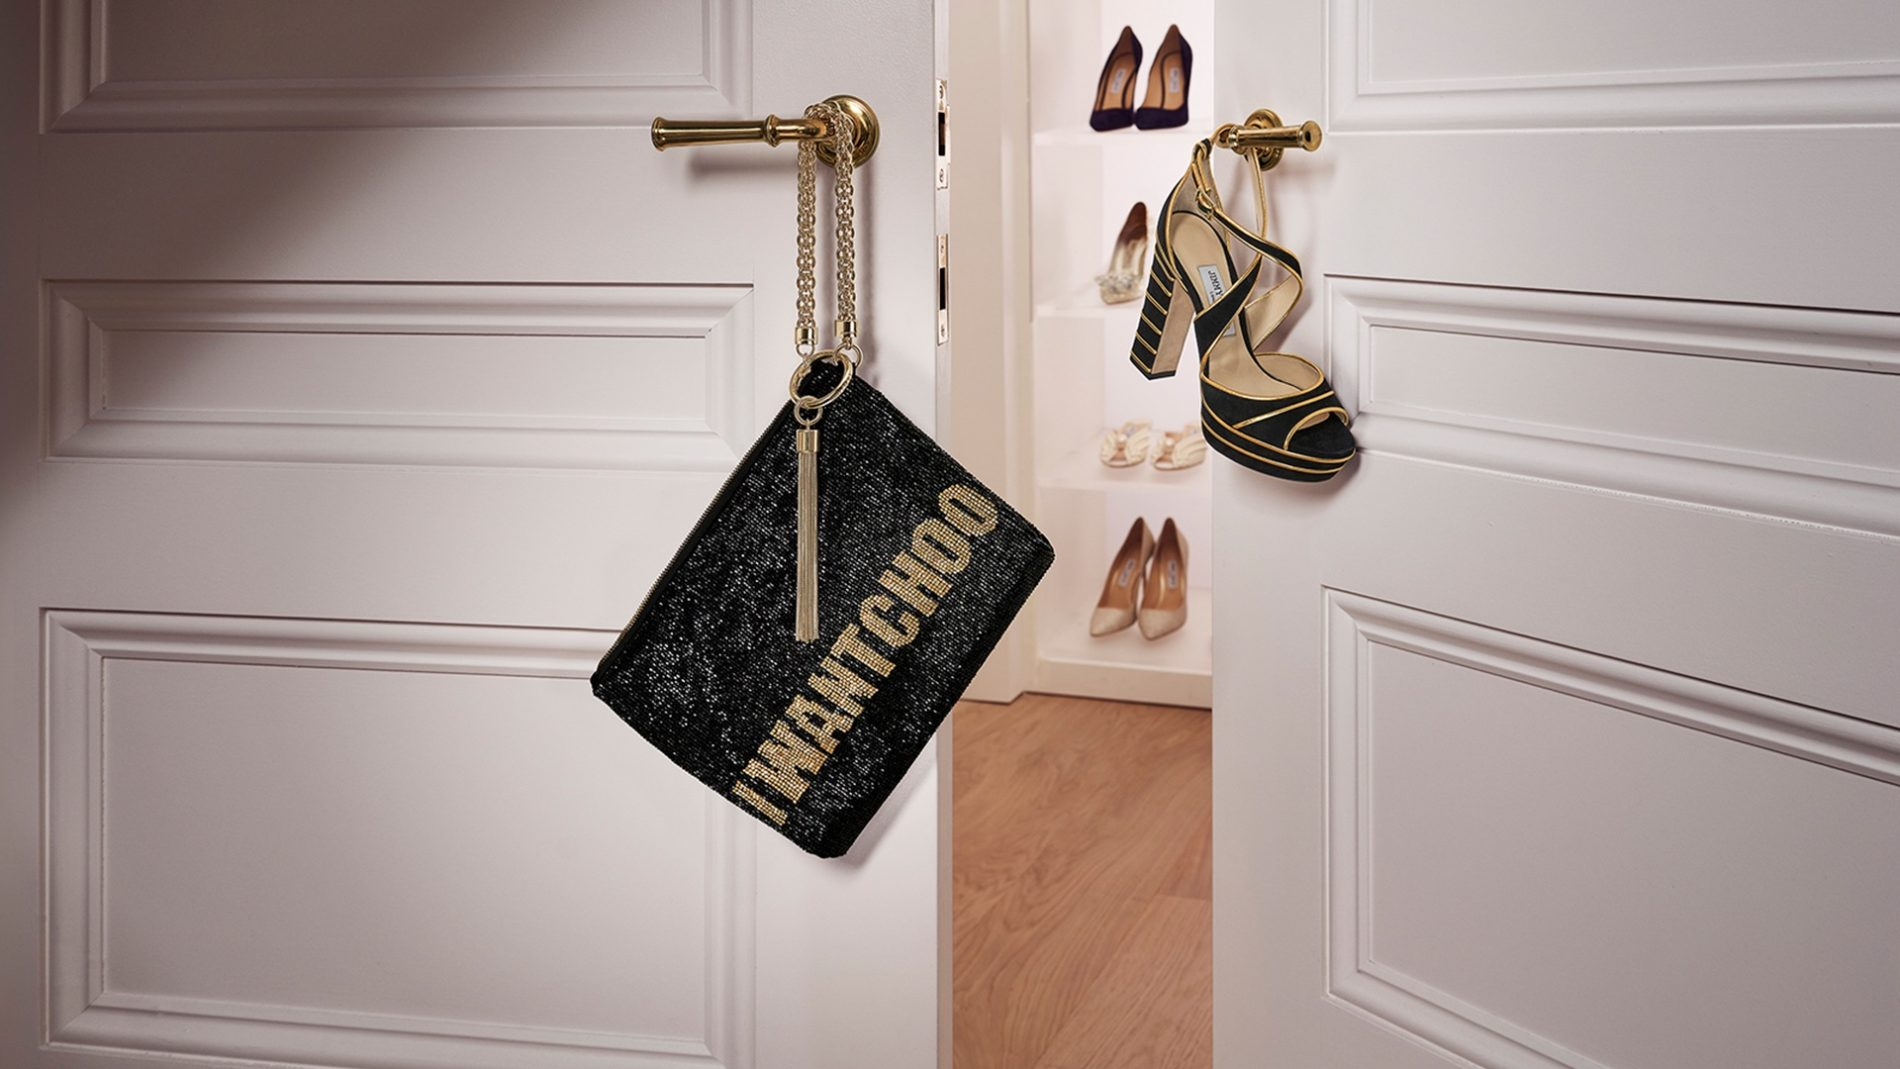 El Corte Inglés Designer Shoes Handbags Jimmy Choo